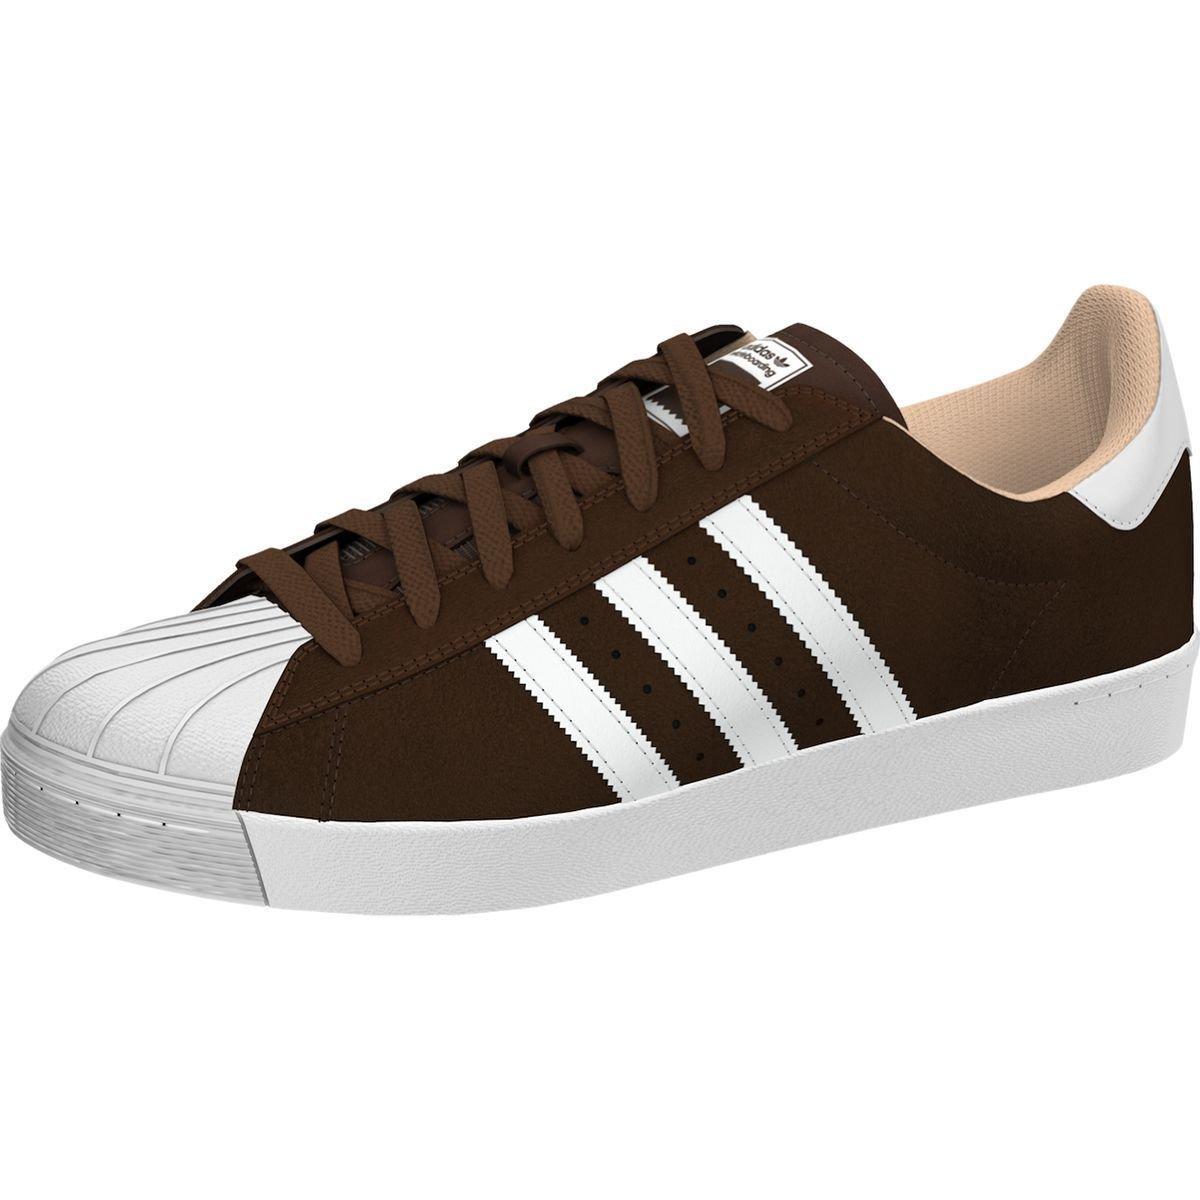 Adidas Men s Superstar Vulc Adv Skate Shoe